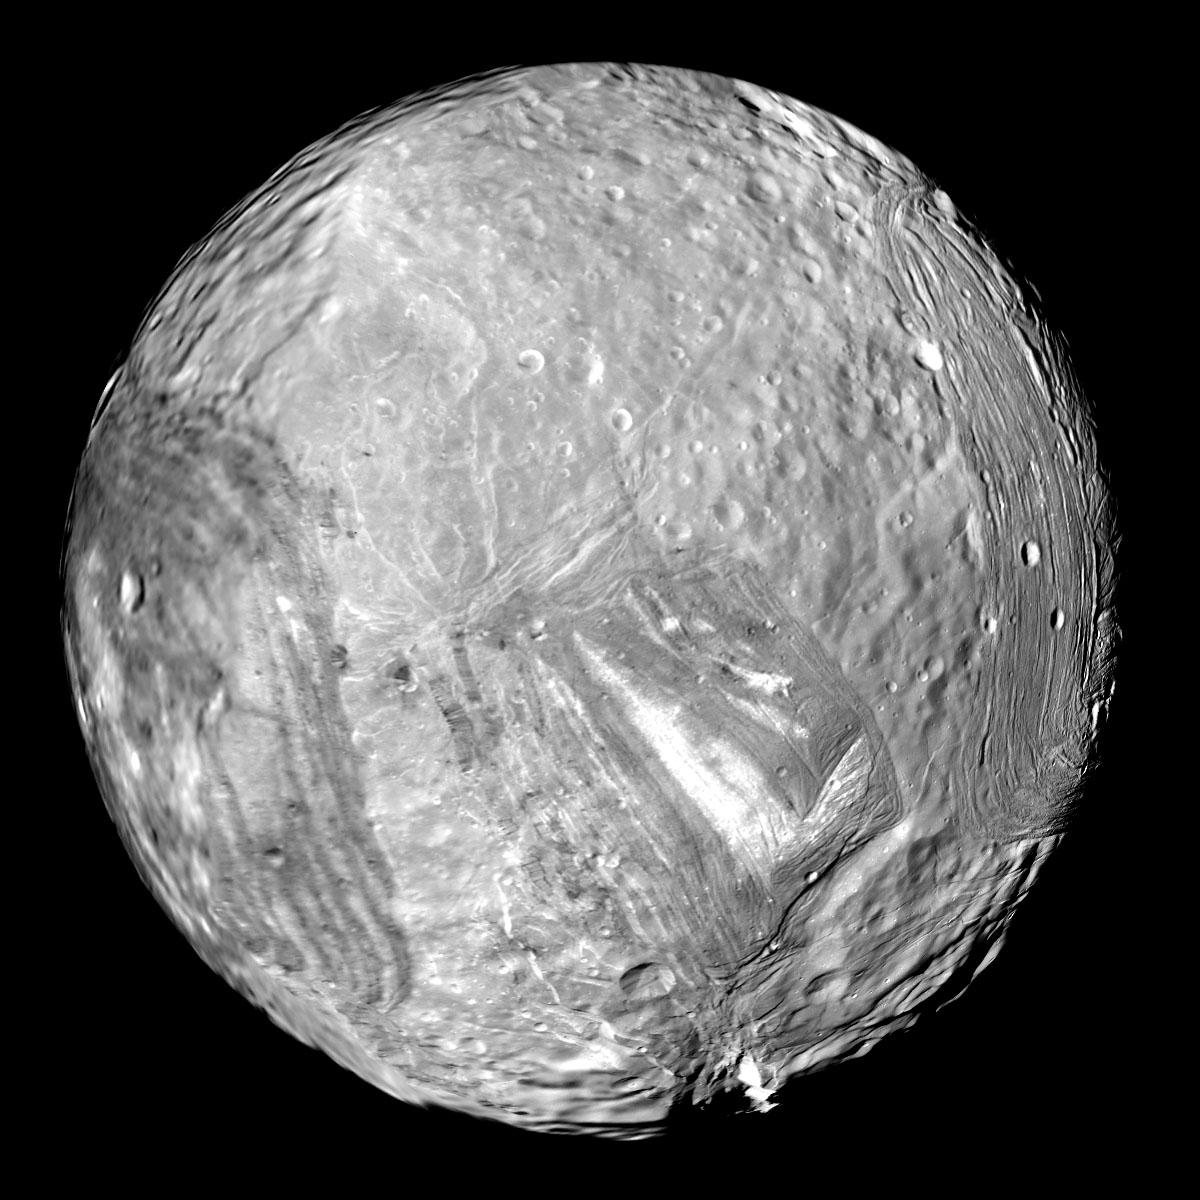 internal uranus moon miranda - photo #16